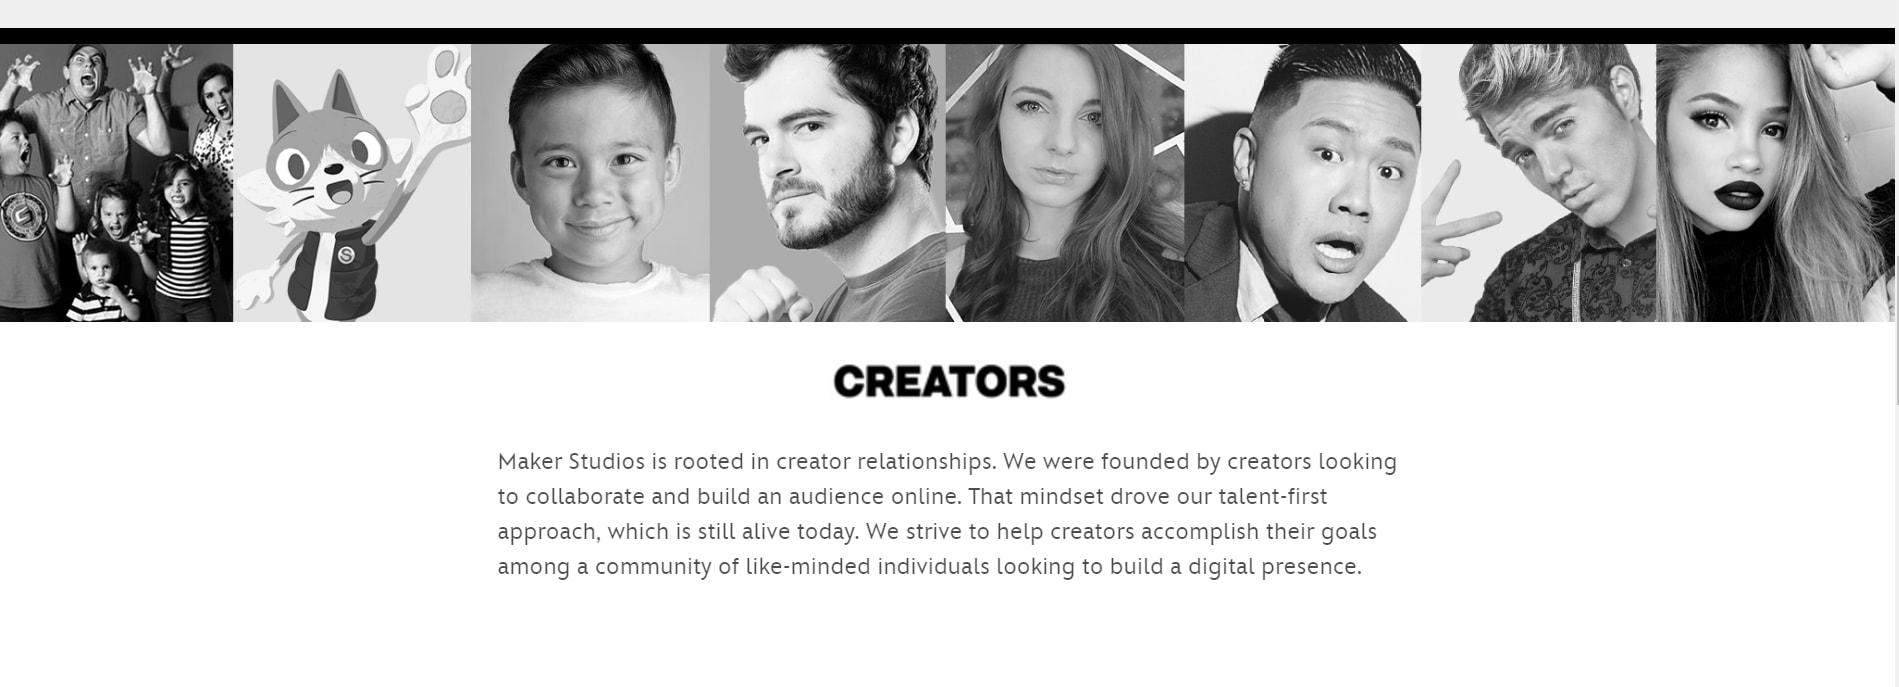 MCN: Maker Studio Creators (Source: Maker Studio, 2016)